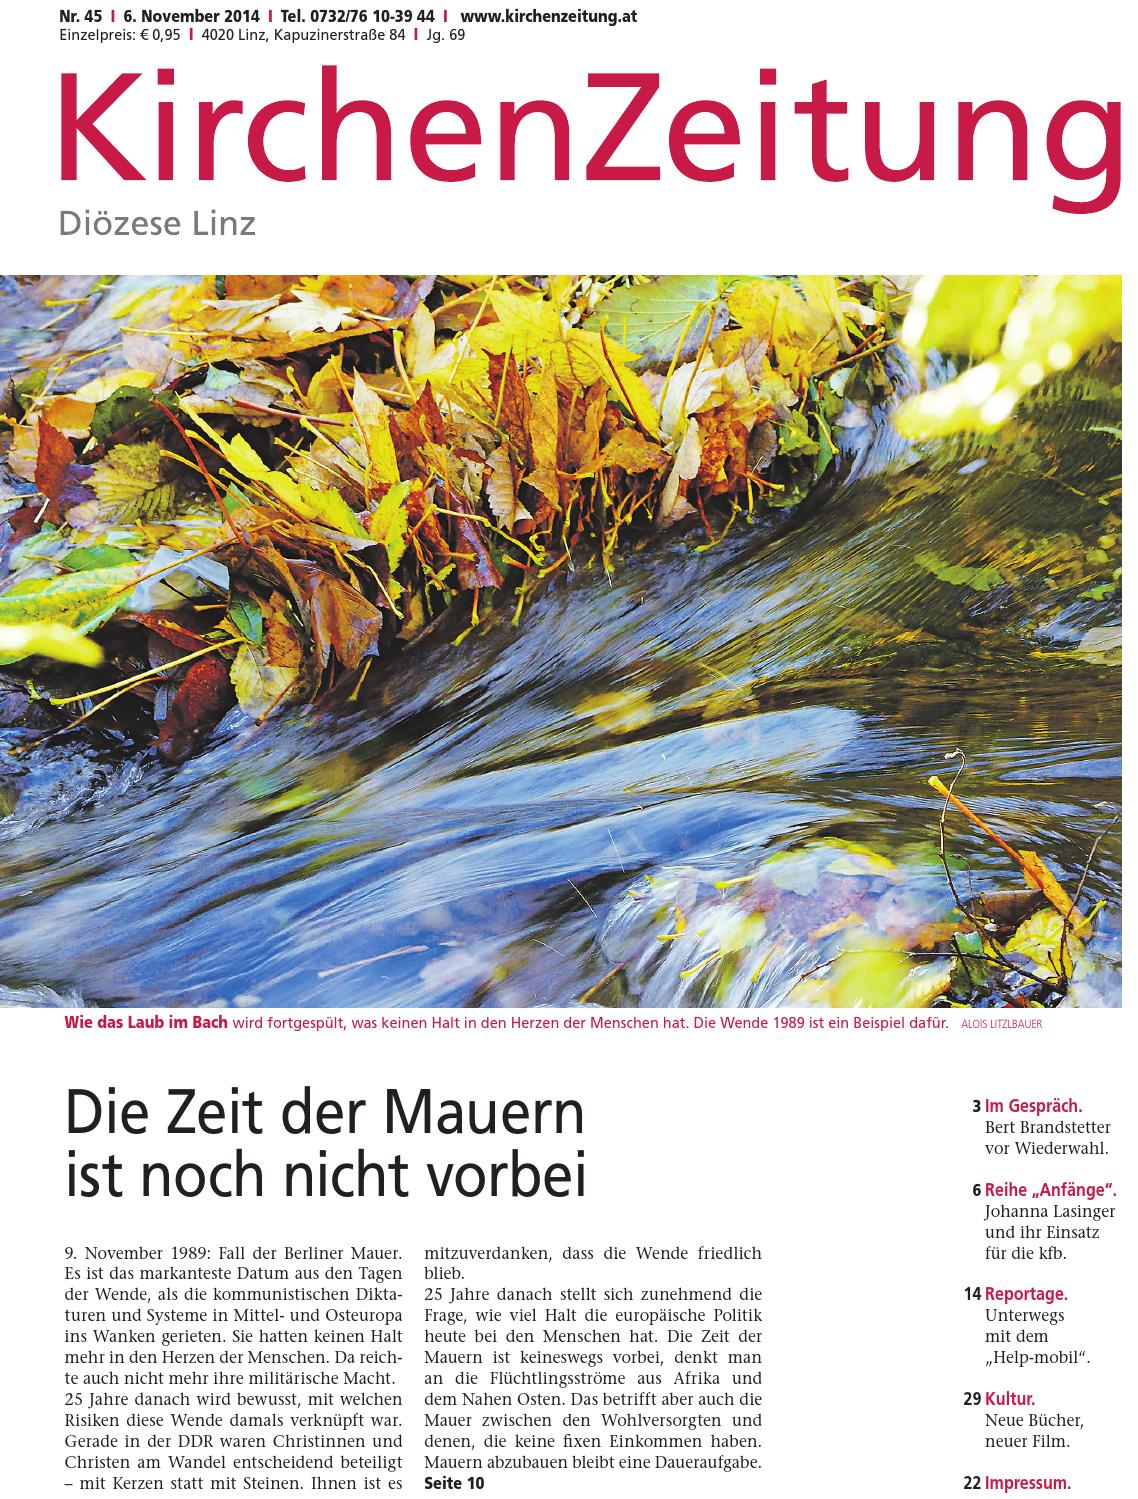 Marchtrenk, Austria Health Class Events | Eventbrite